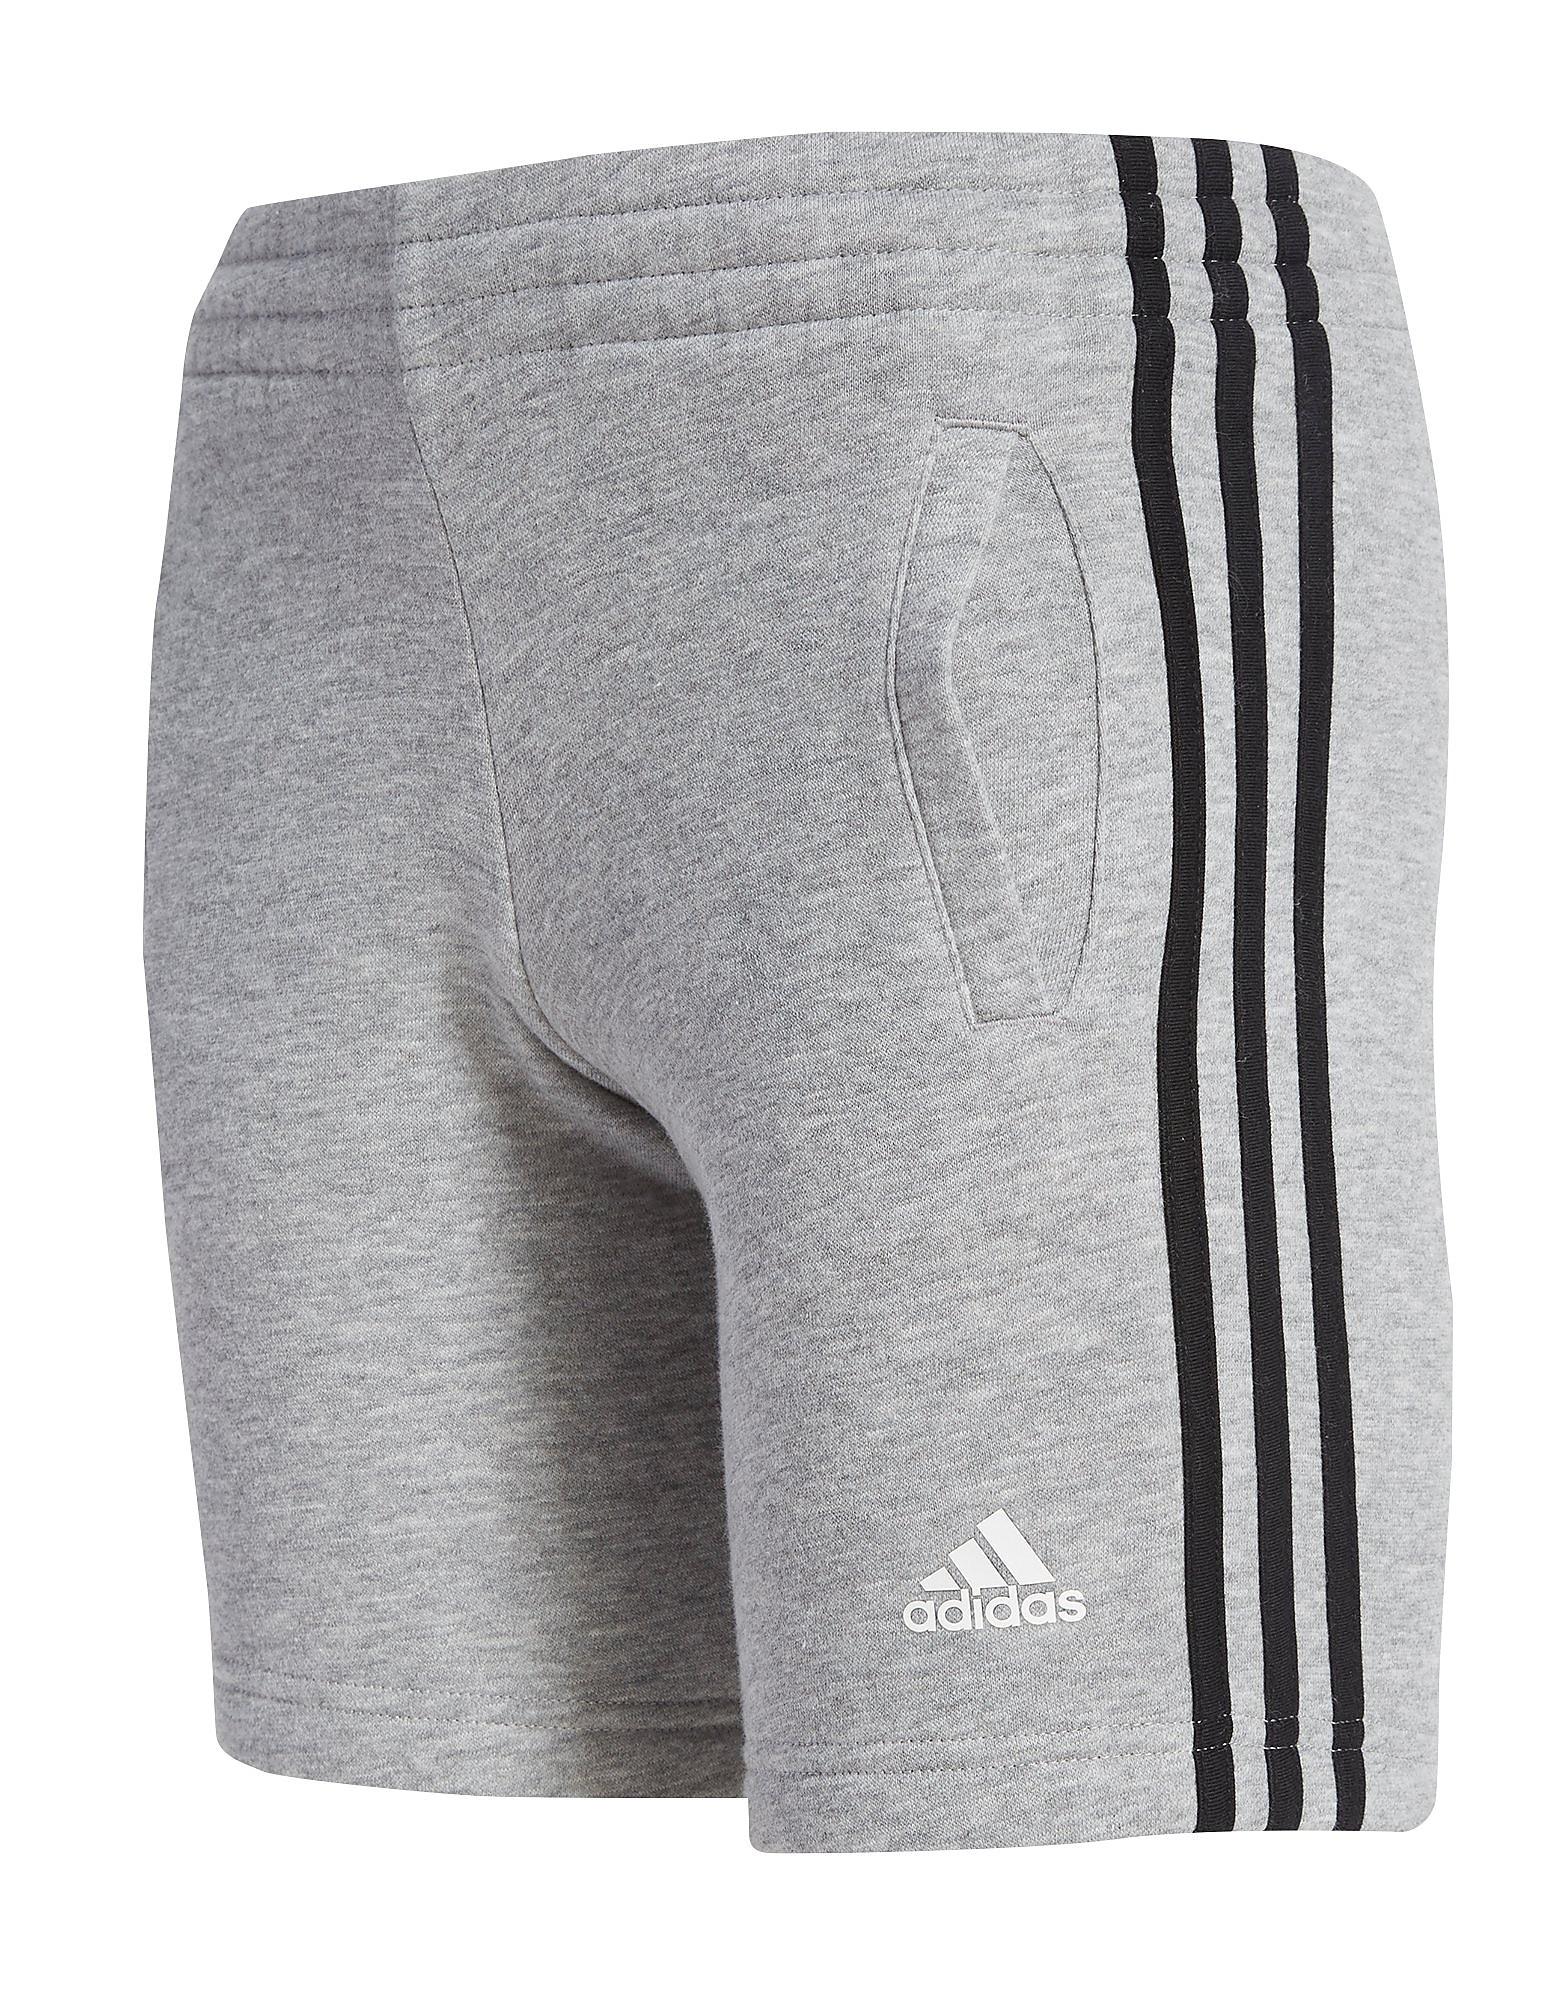 adidas Linear Shorts Children  - Grijs - Kind